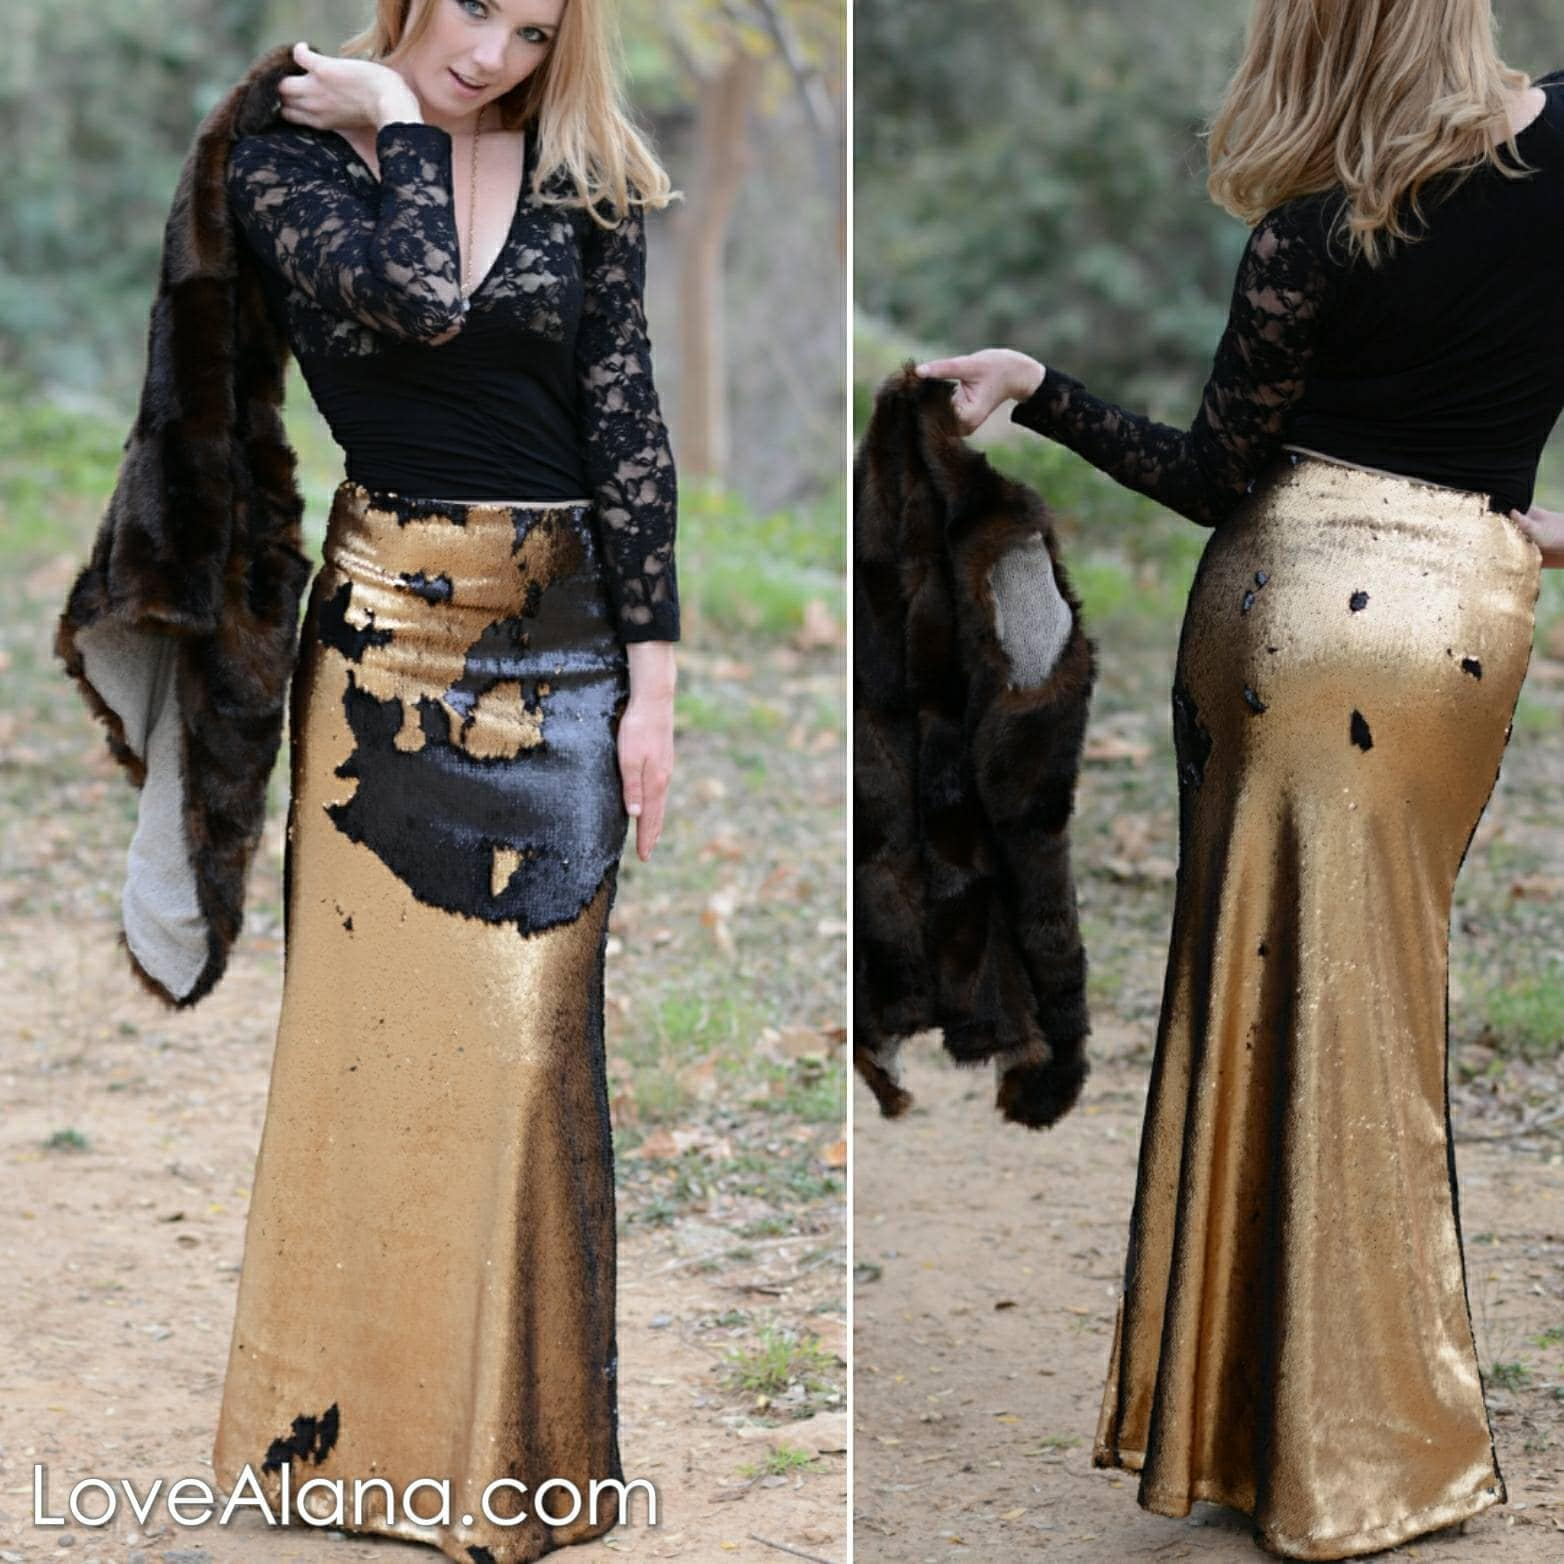 83ac157b0 50% OFF - Small Matte Black/Dark Gold Flip Sequin Maxi - Gorgeous ...